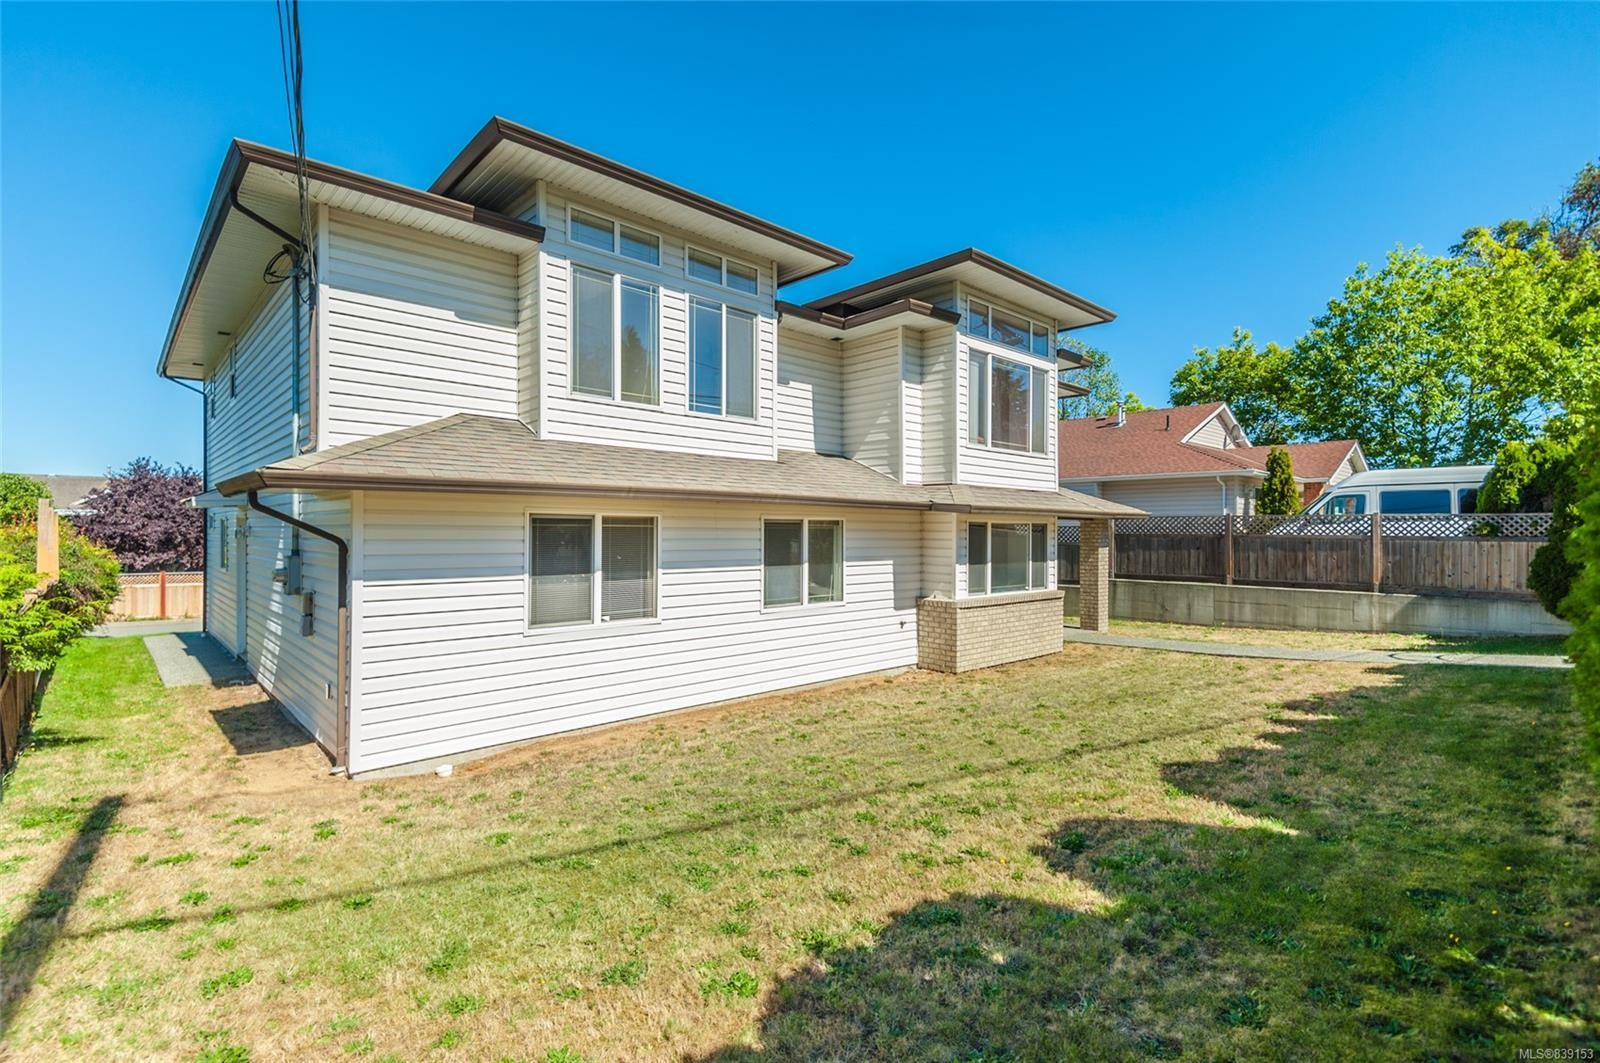 Photo 18: Photos: 6412 Dover Rd in NANAIMO: Na North Nanaimo House for sale (Nanaimo)  : MLS®# 839153